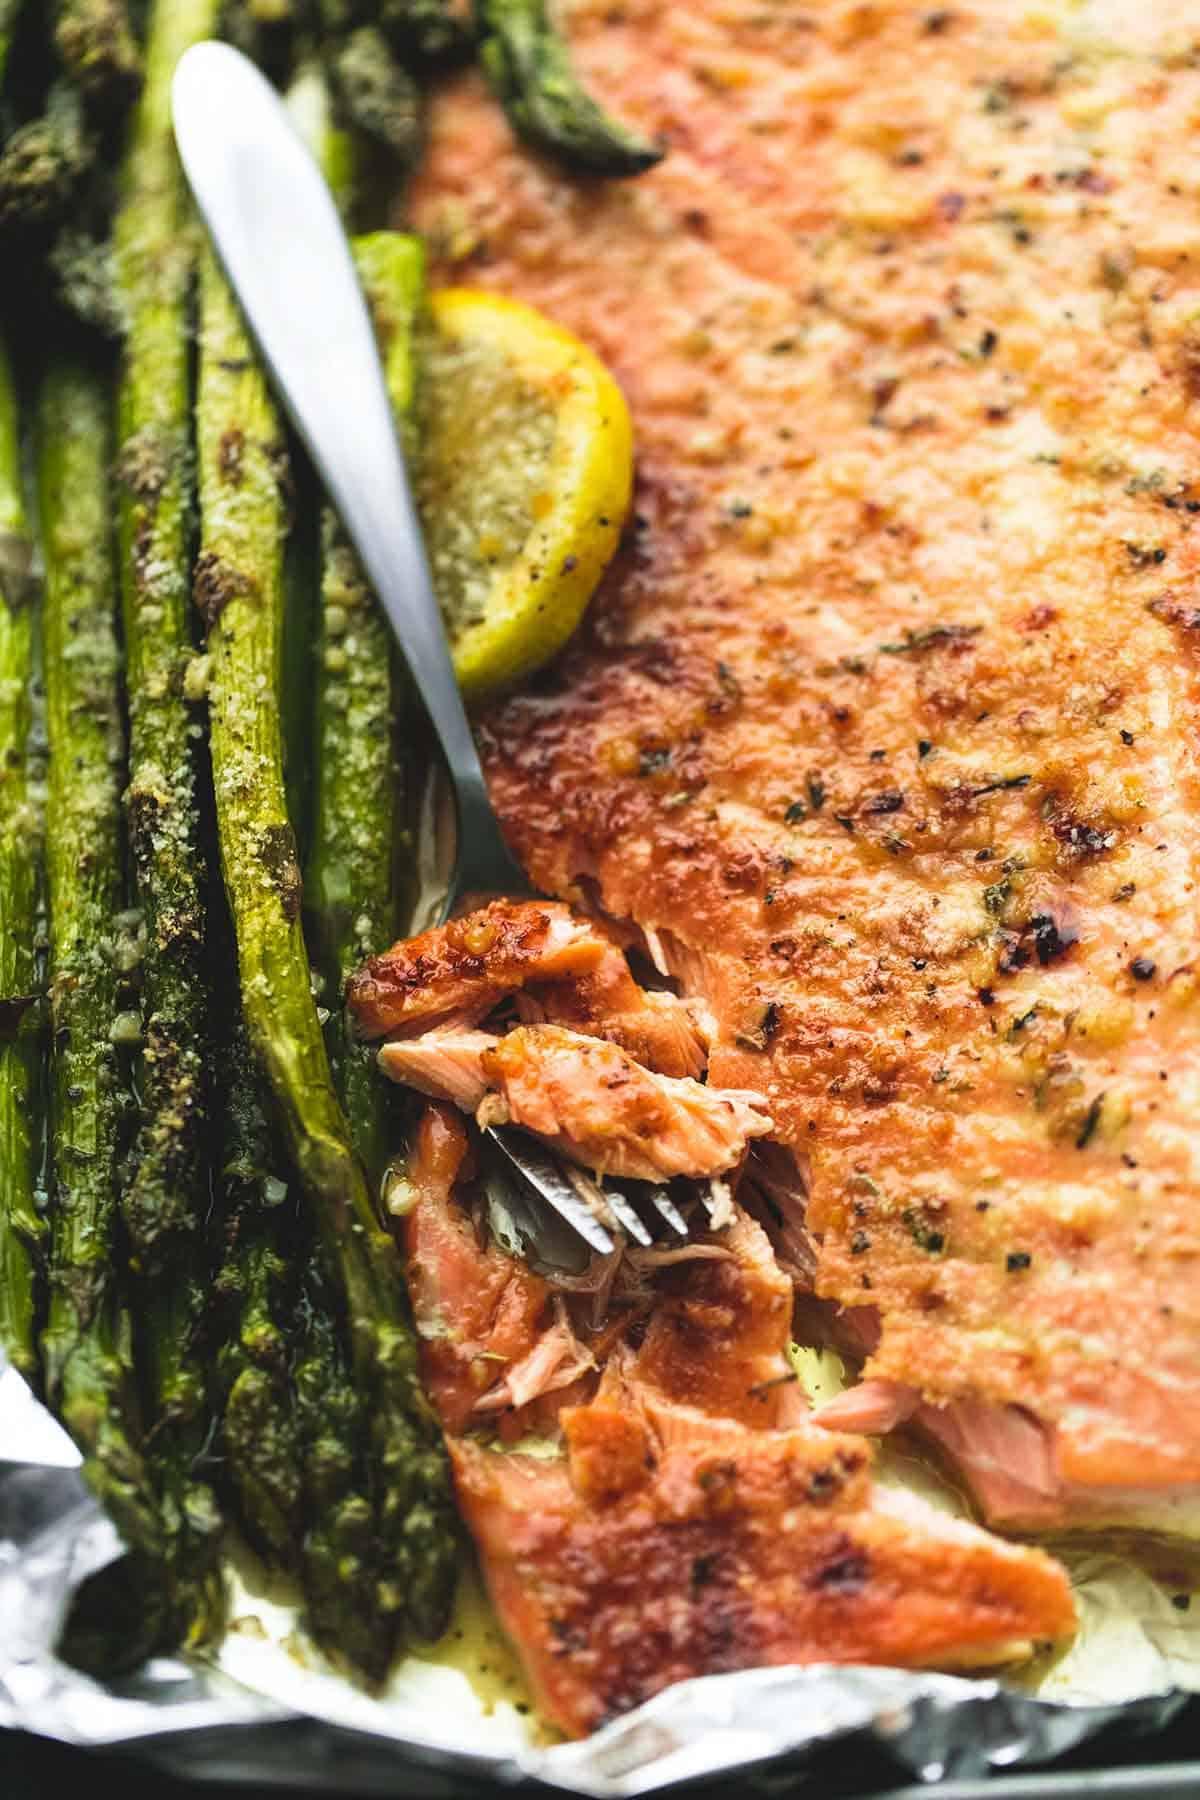 Baked Lemon Parmesan Salmon & Asparagus in Foil | lecremedelacrumb.com | lecremedelacrumb.com